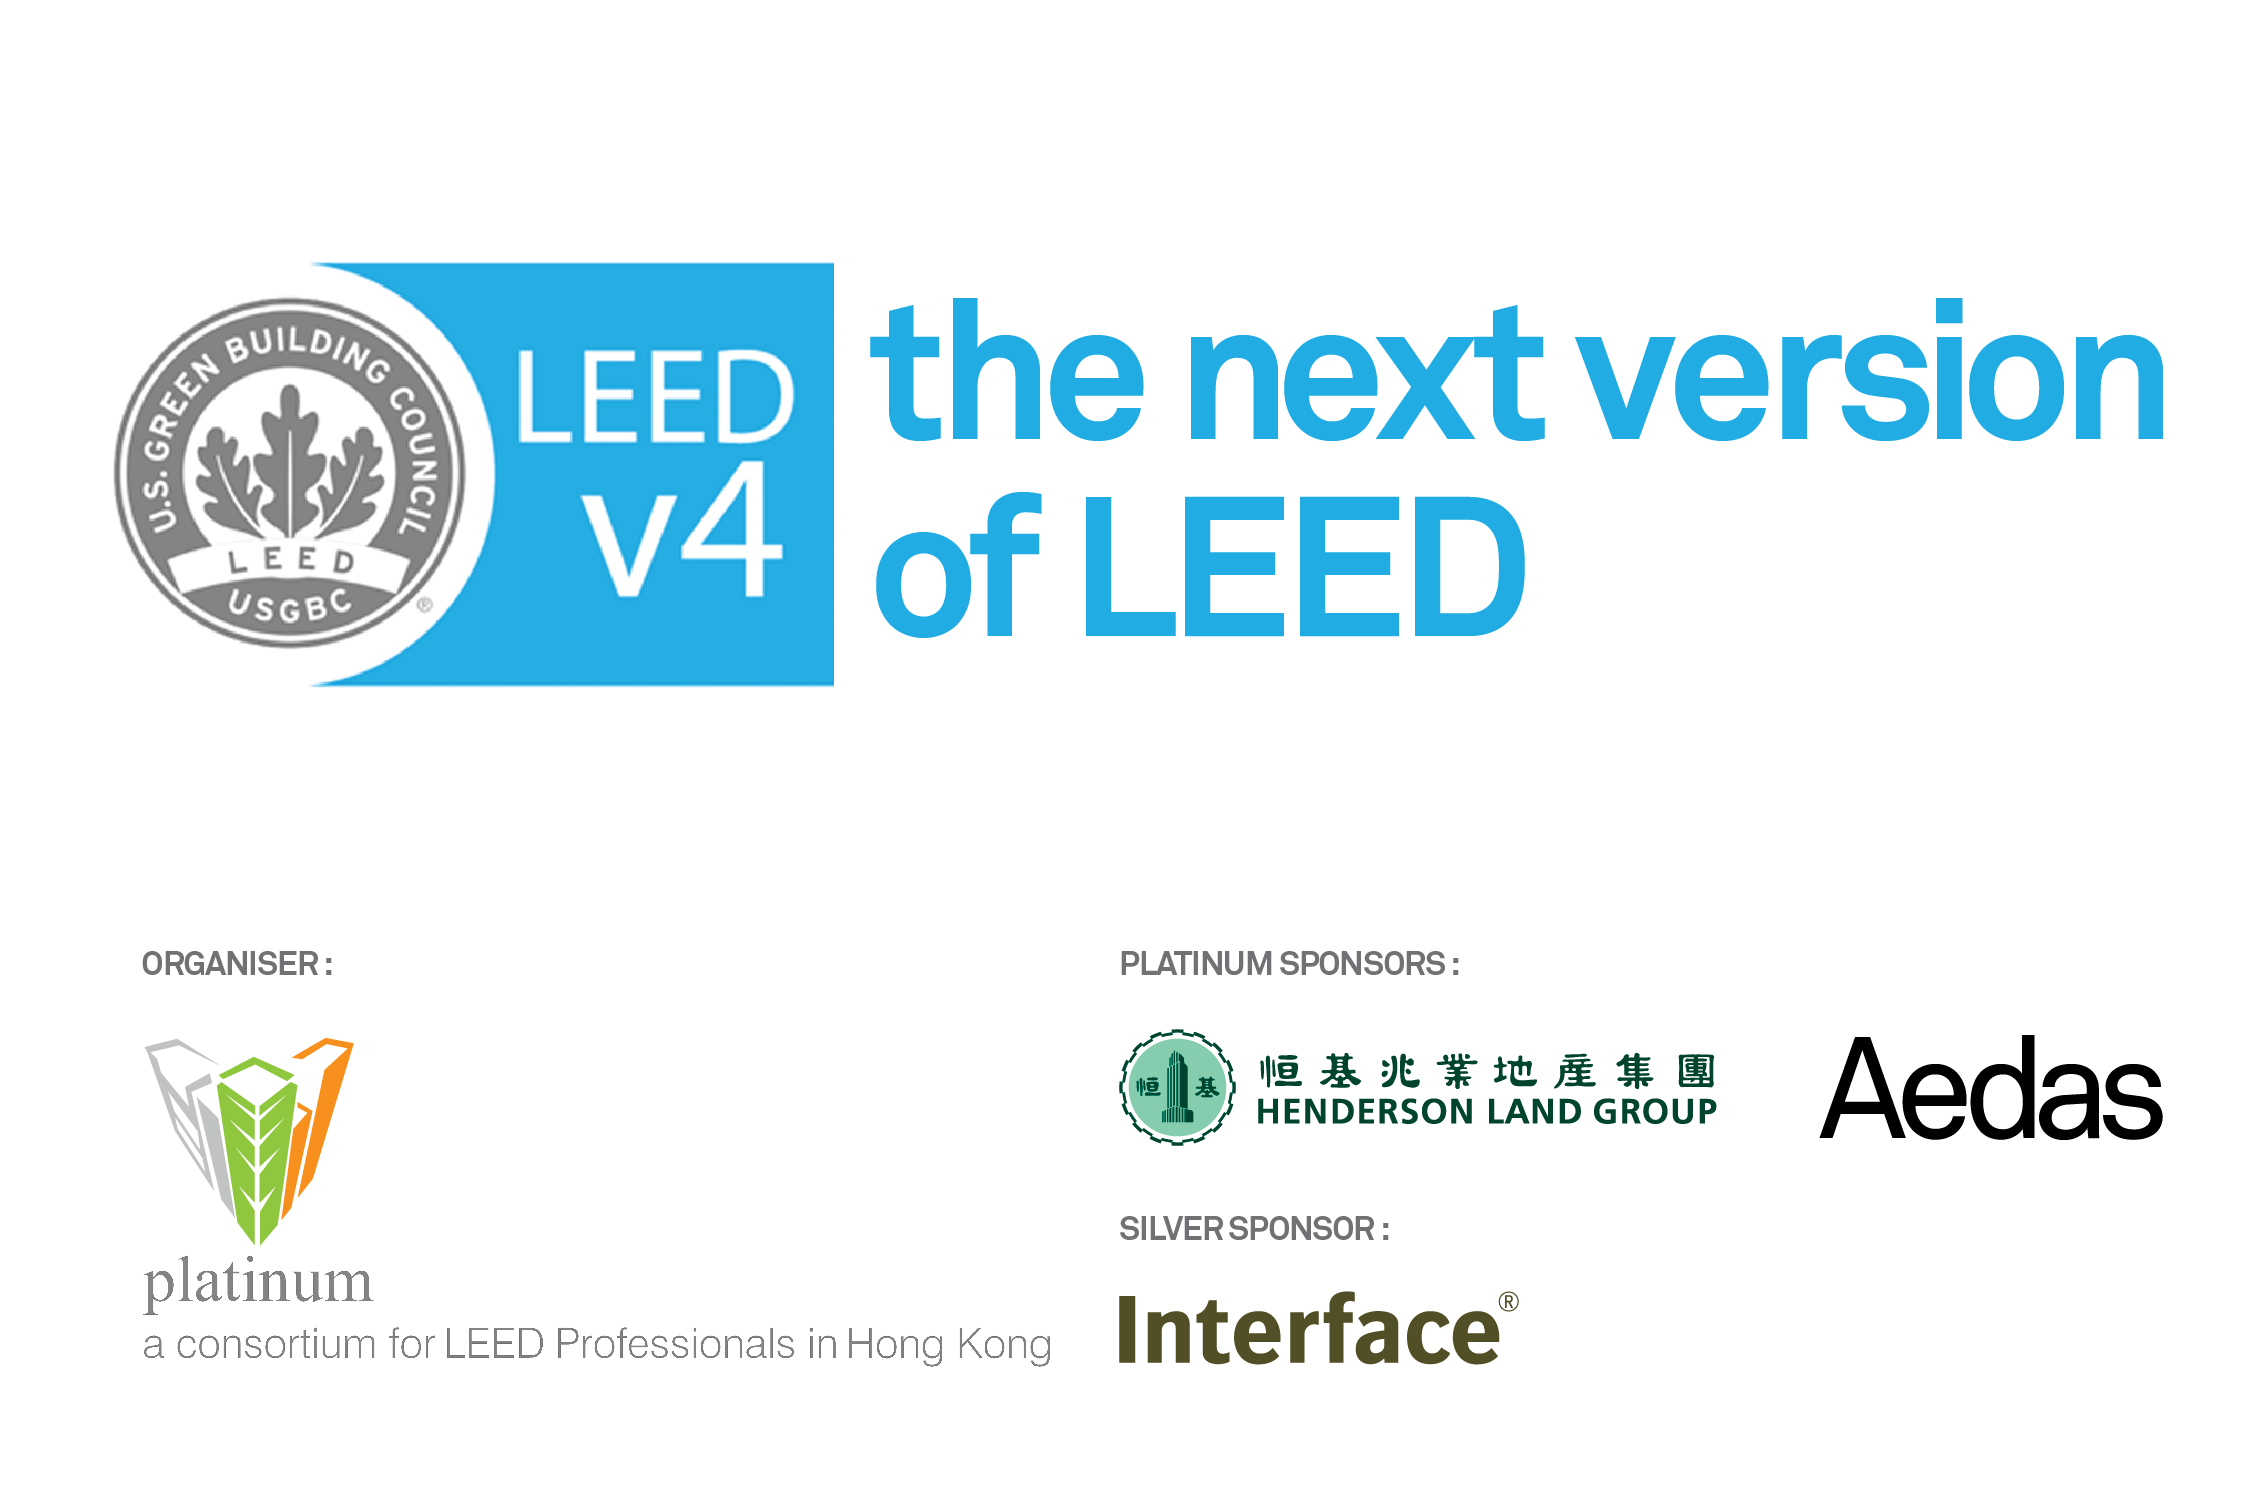 20130618-O-LEED v4 event_Signage-Jpeg.jpg